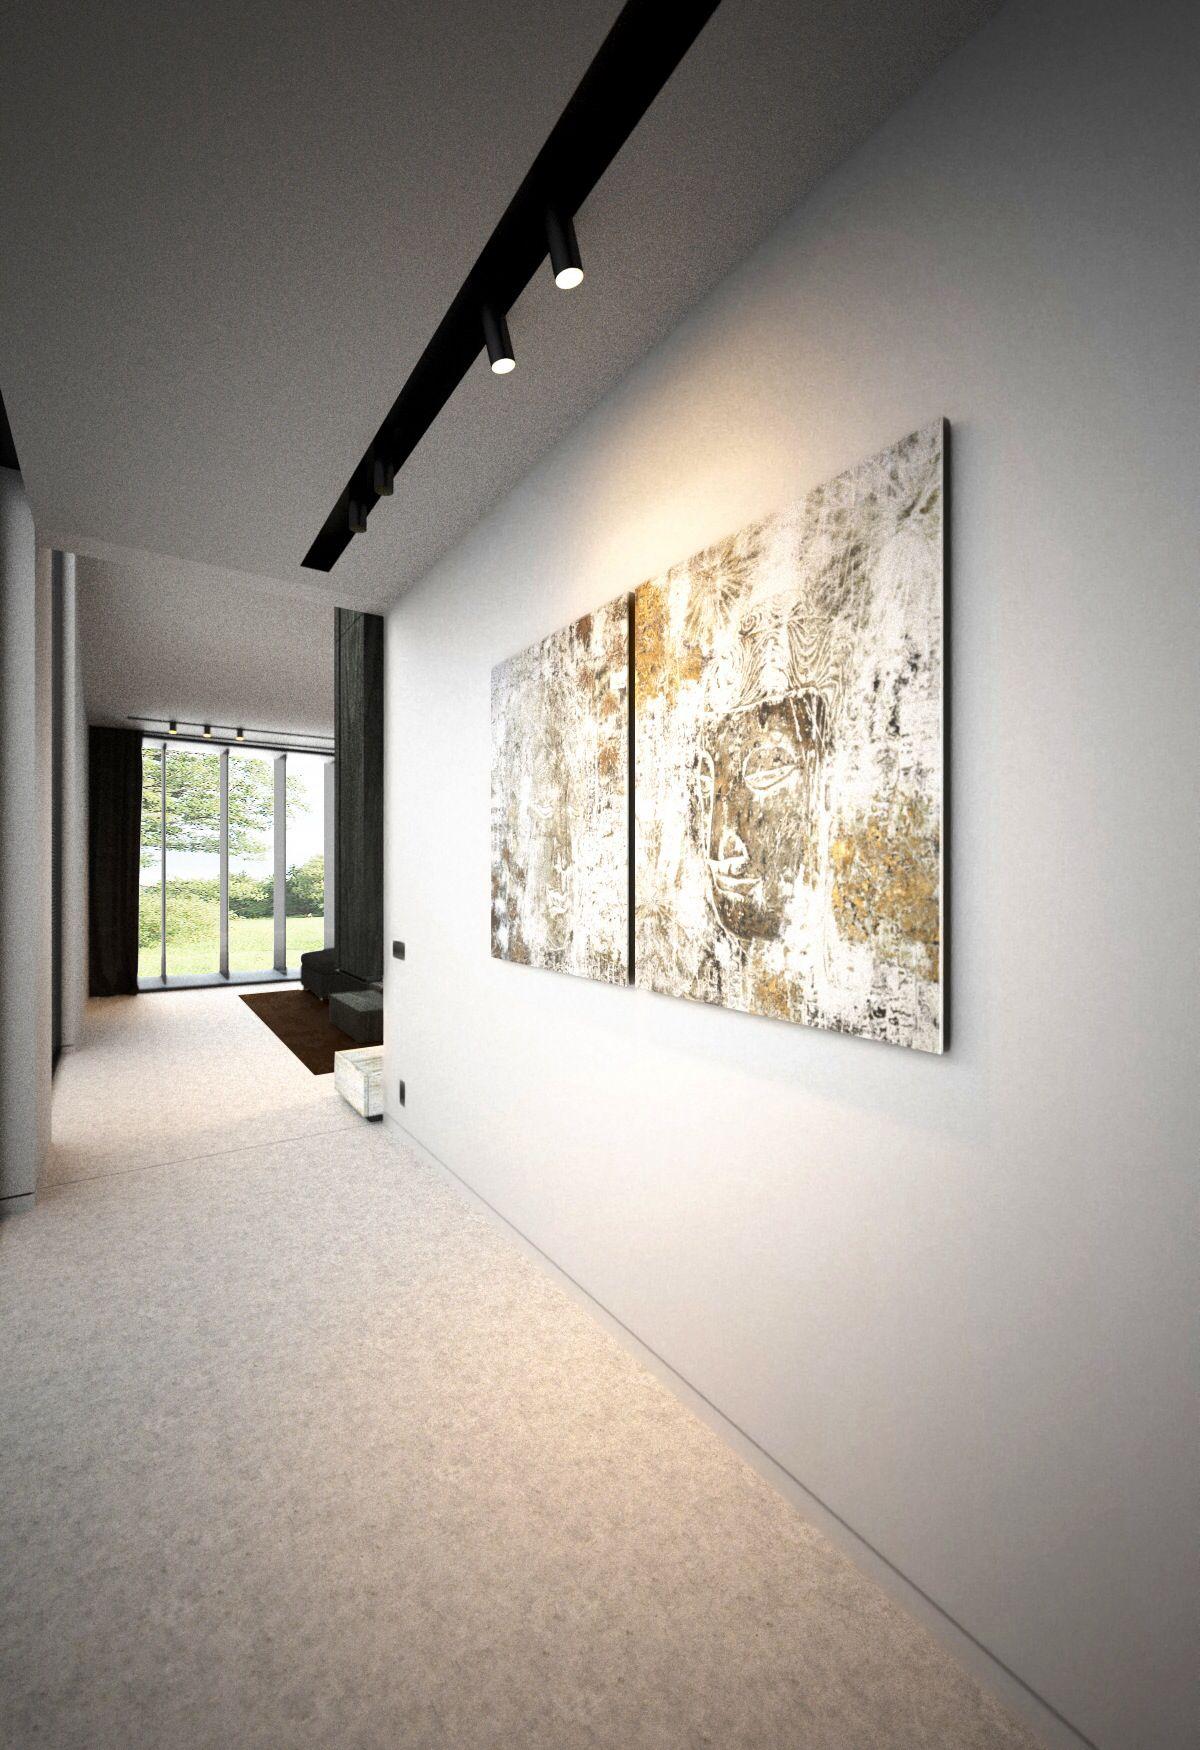 Interior architecture | l i g h t | Pinterest | Interior ...